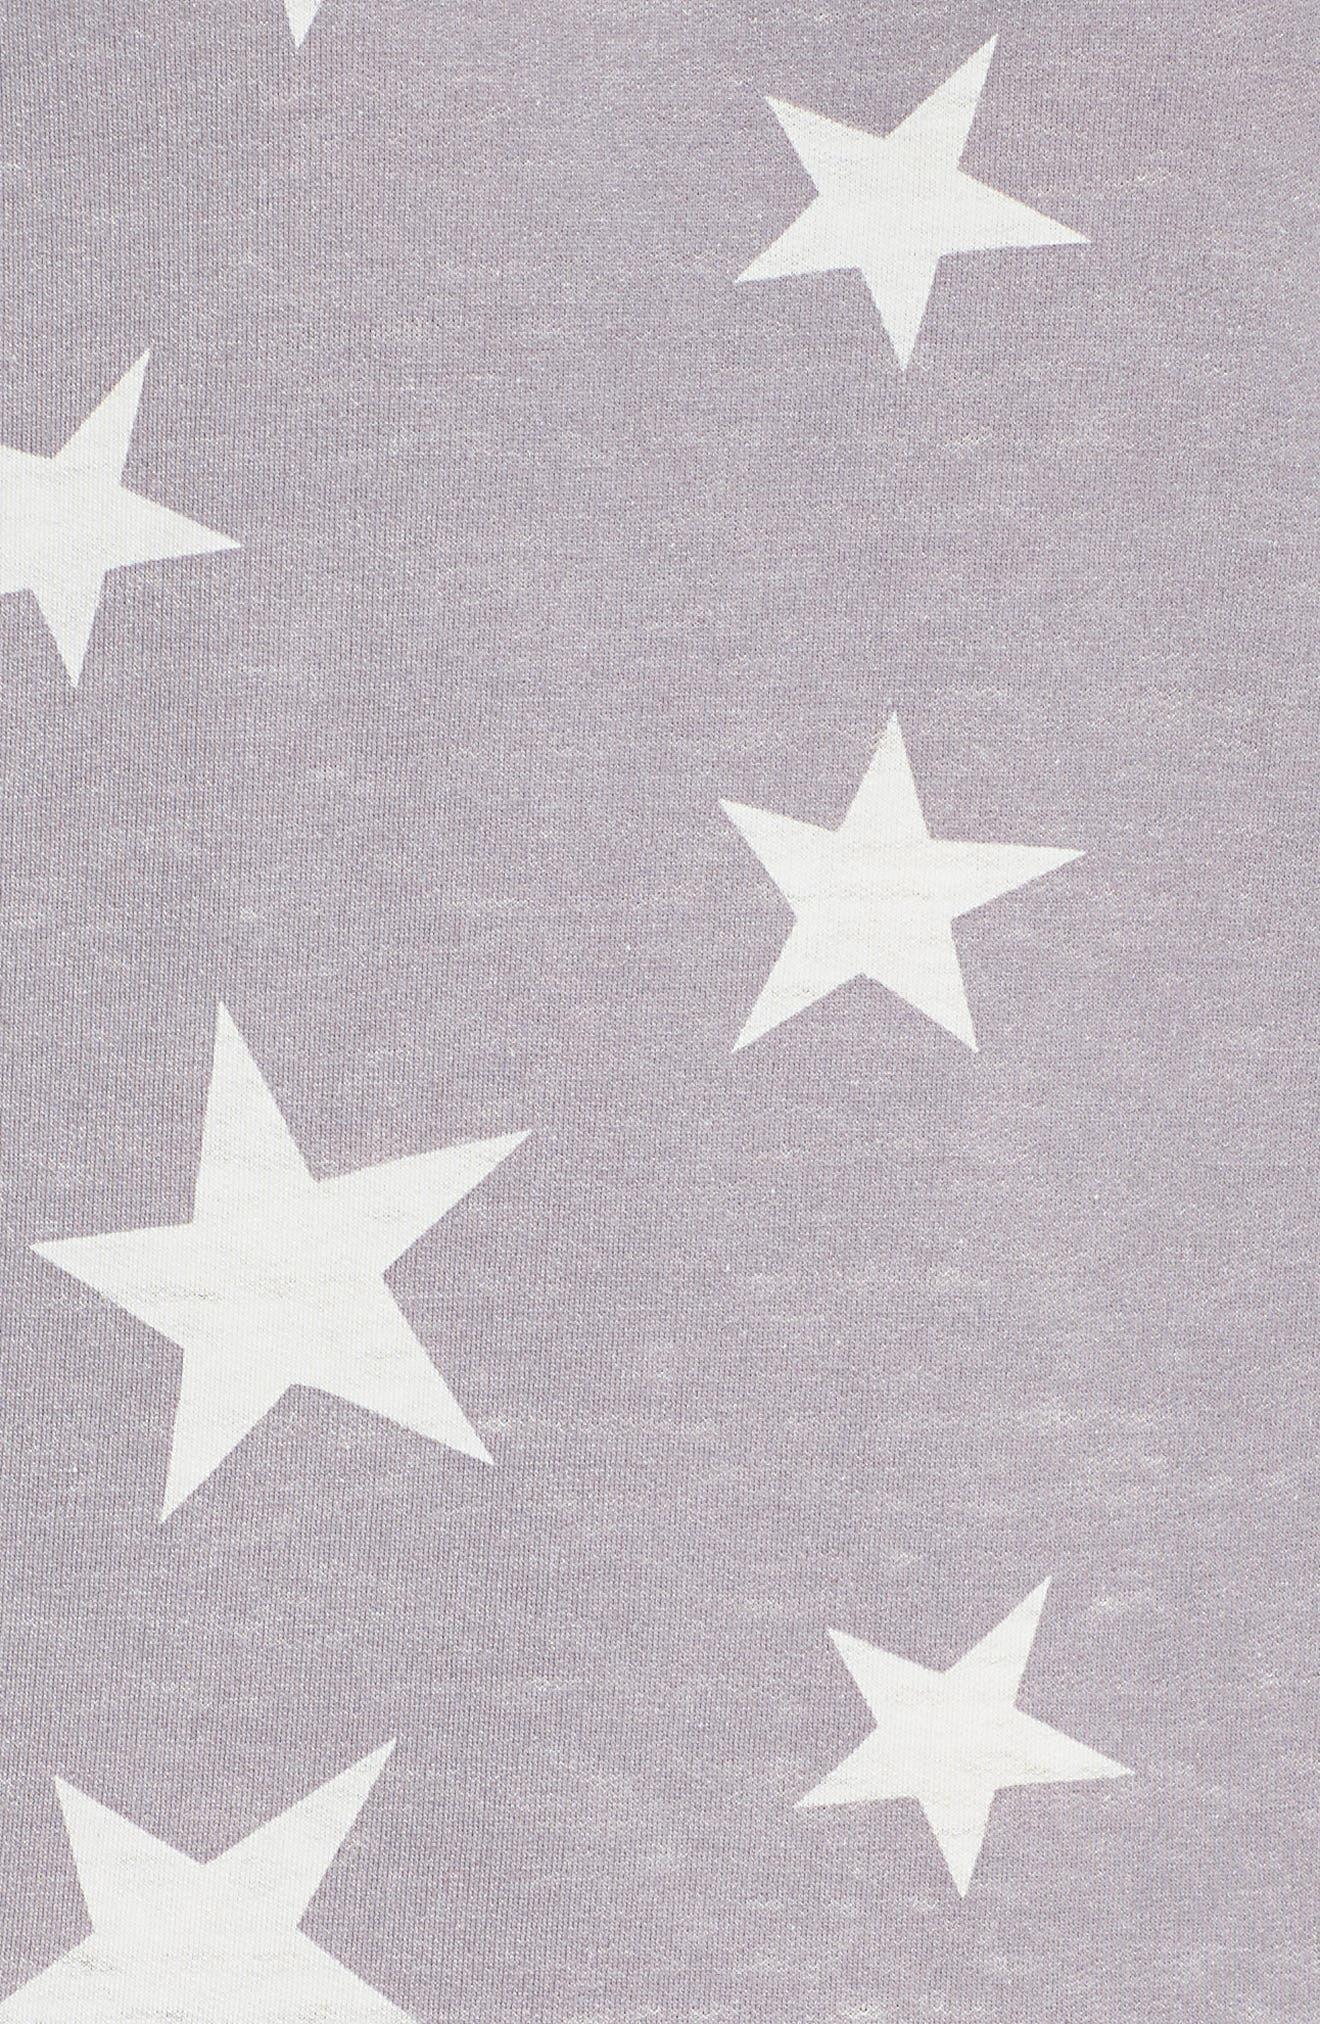 HONEYDEW INTIMATES, Burnout Lounge Sweatshirt, Alternate thumbnail 5, color, 031